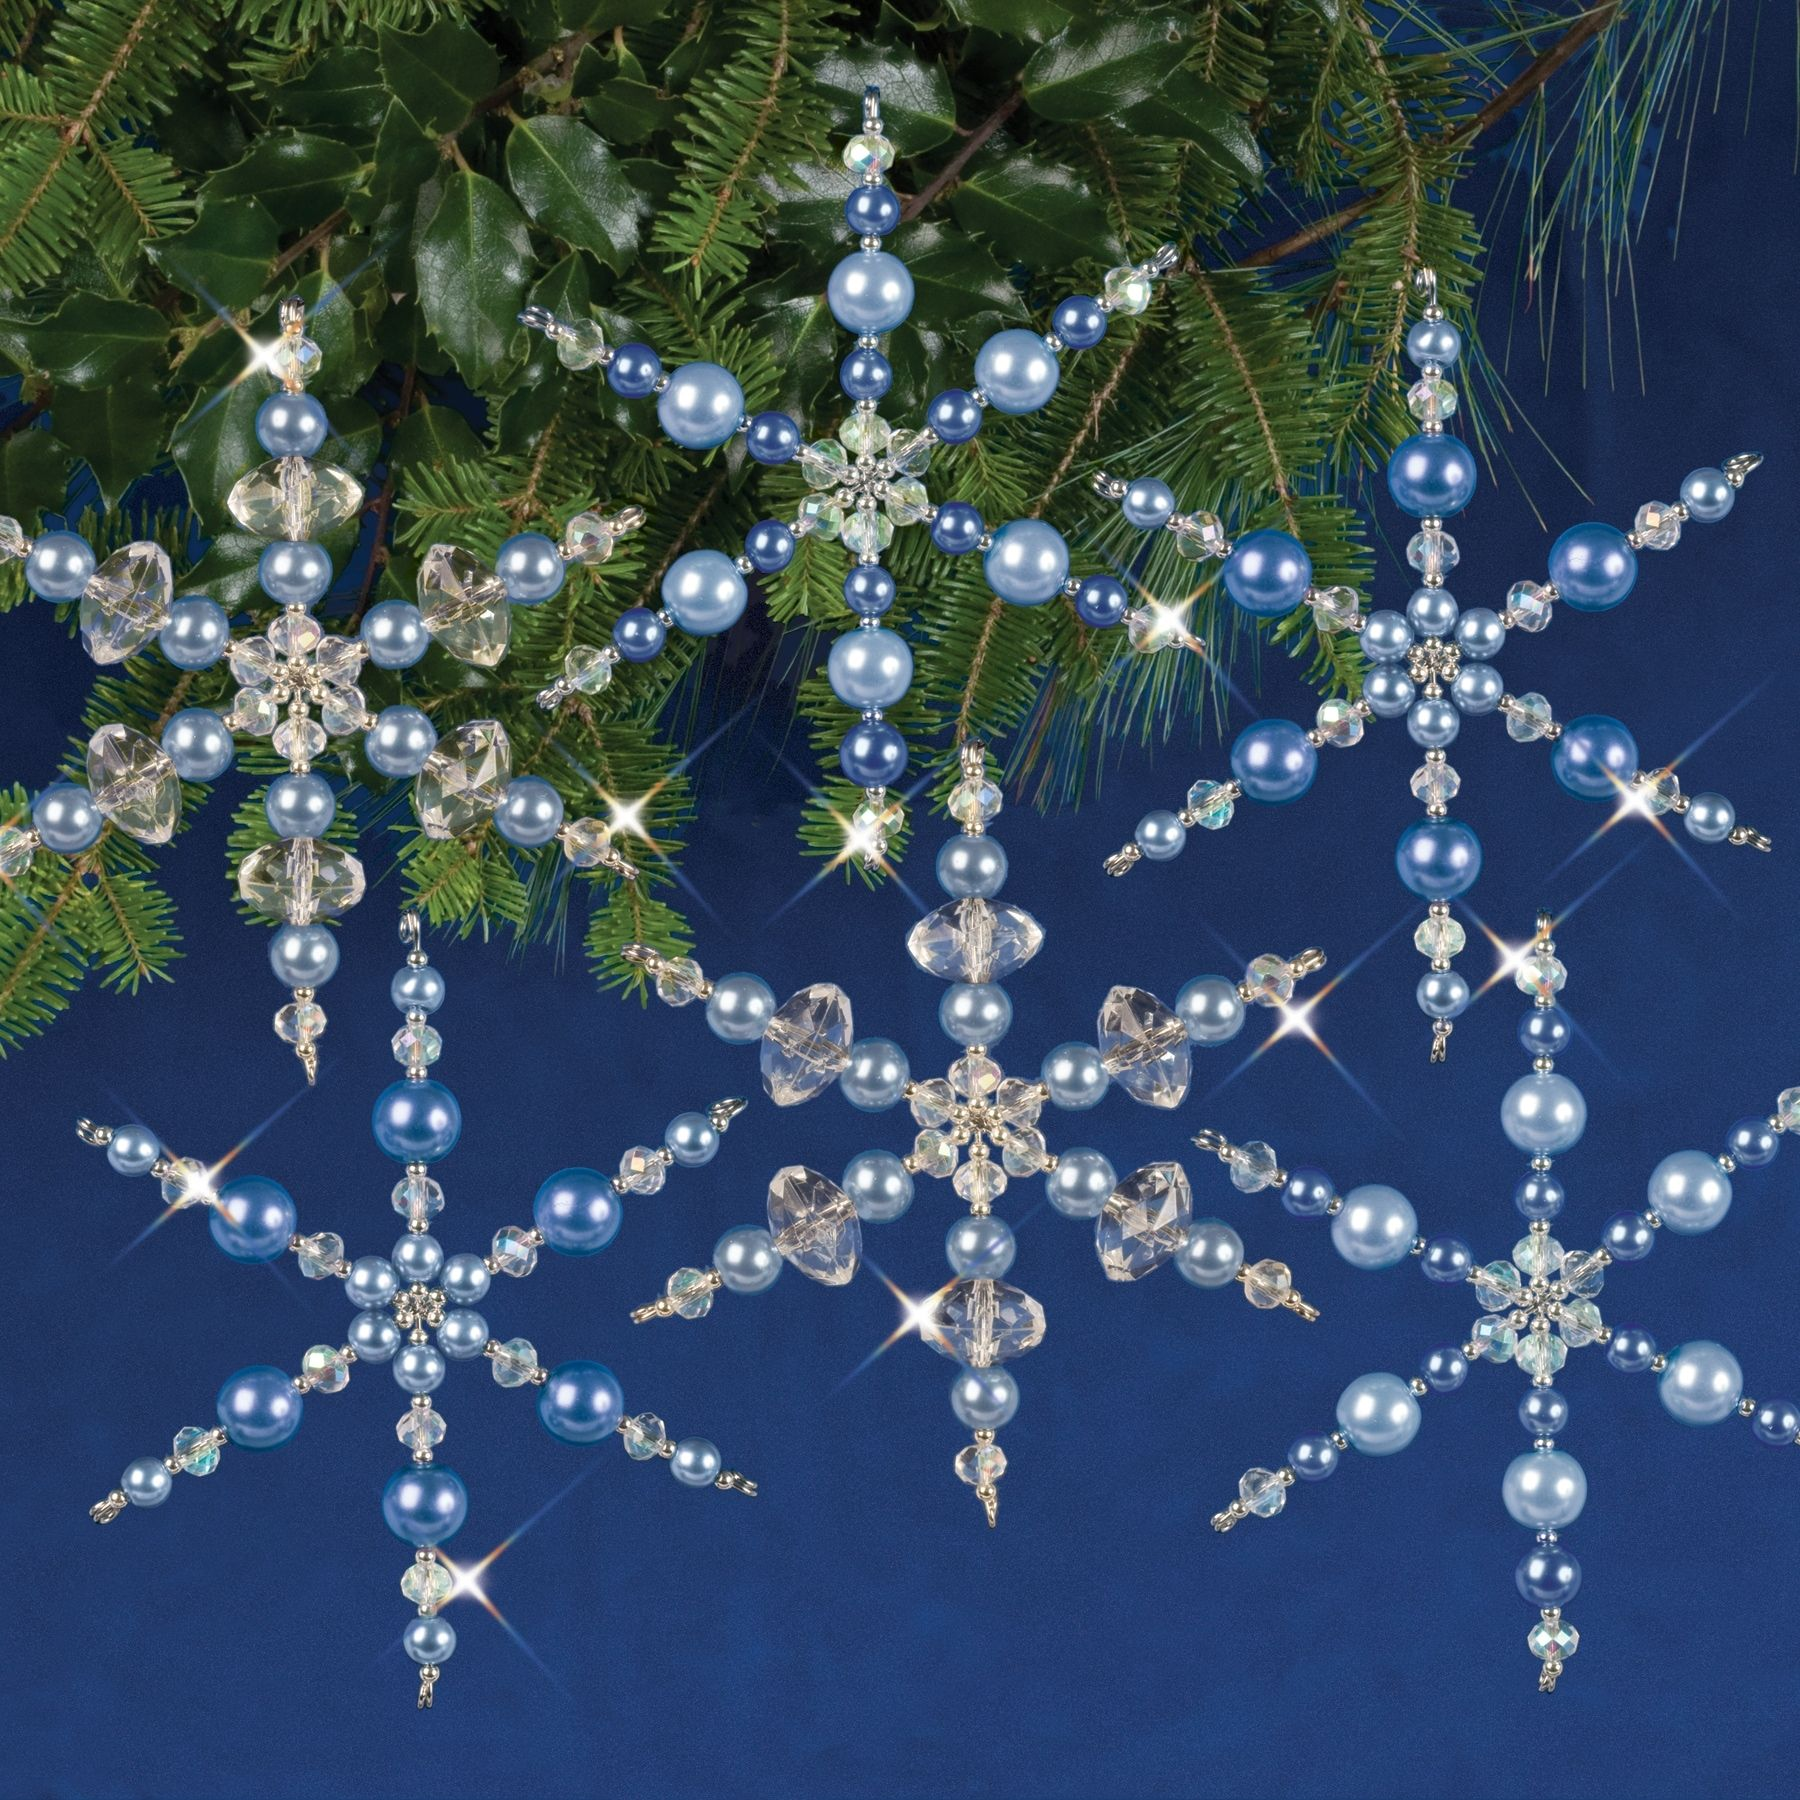 Nostalgic Beaded Ornament Kit RUBY SNOWFLAKES Holiday Ornaments Makes Up to 8